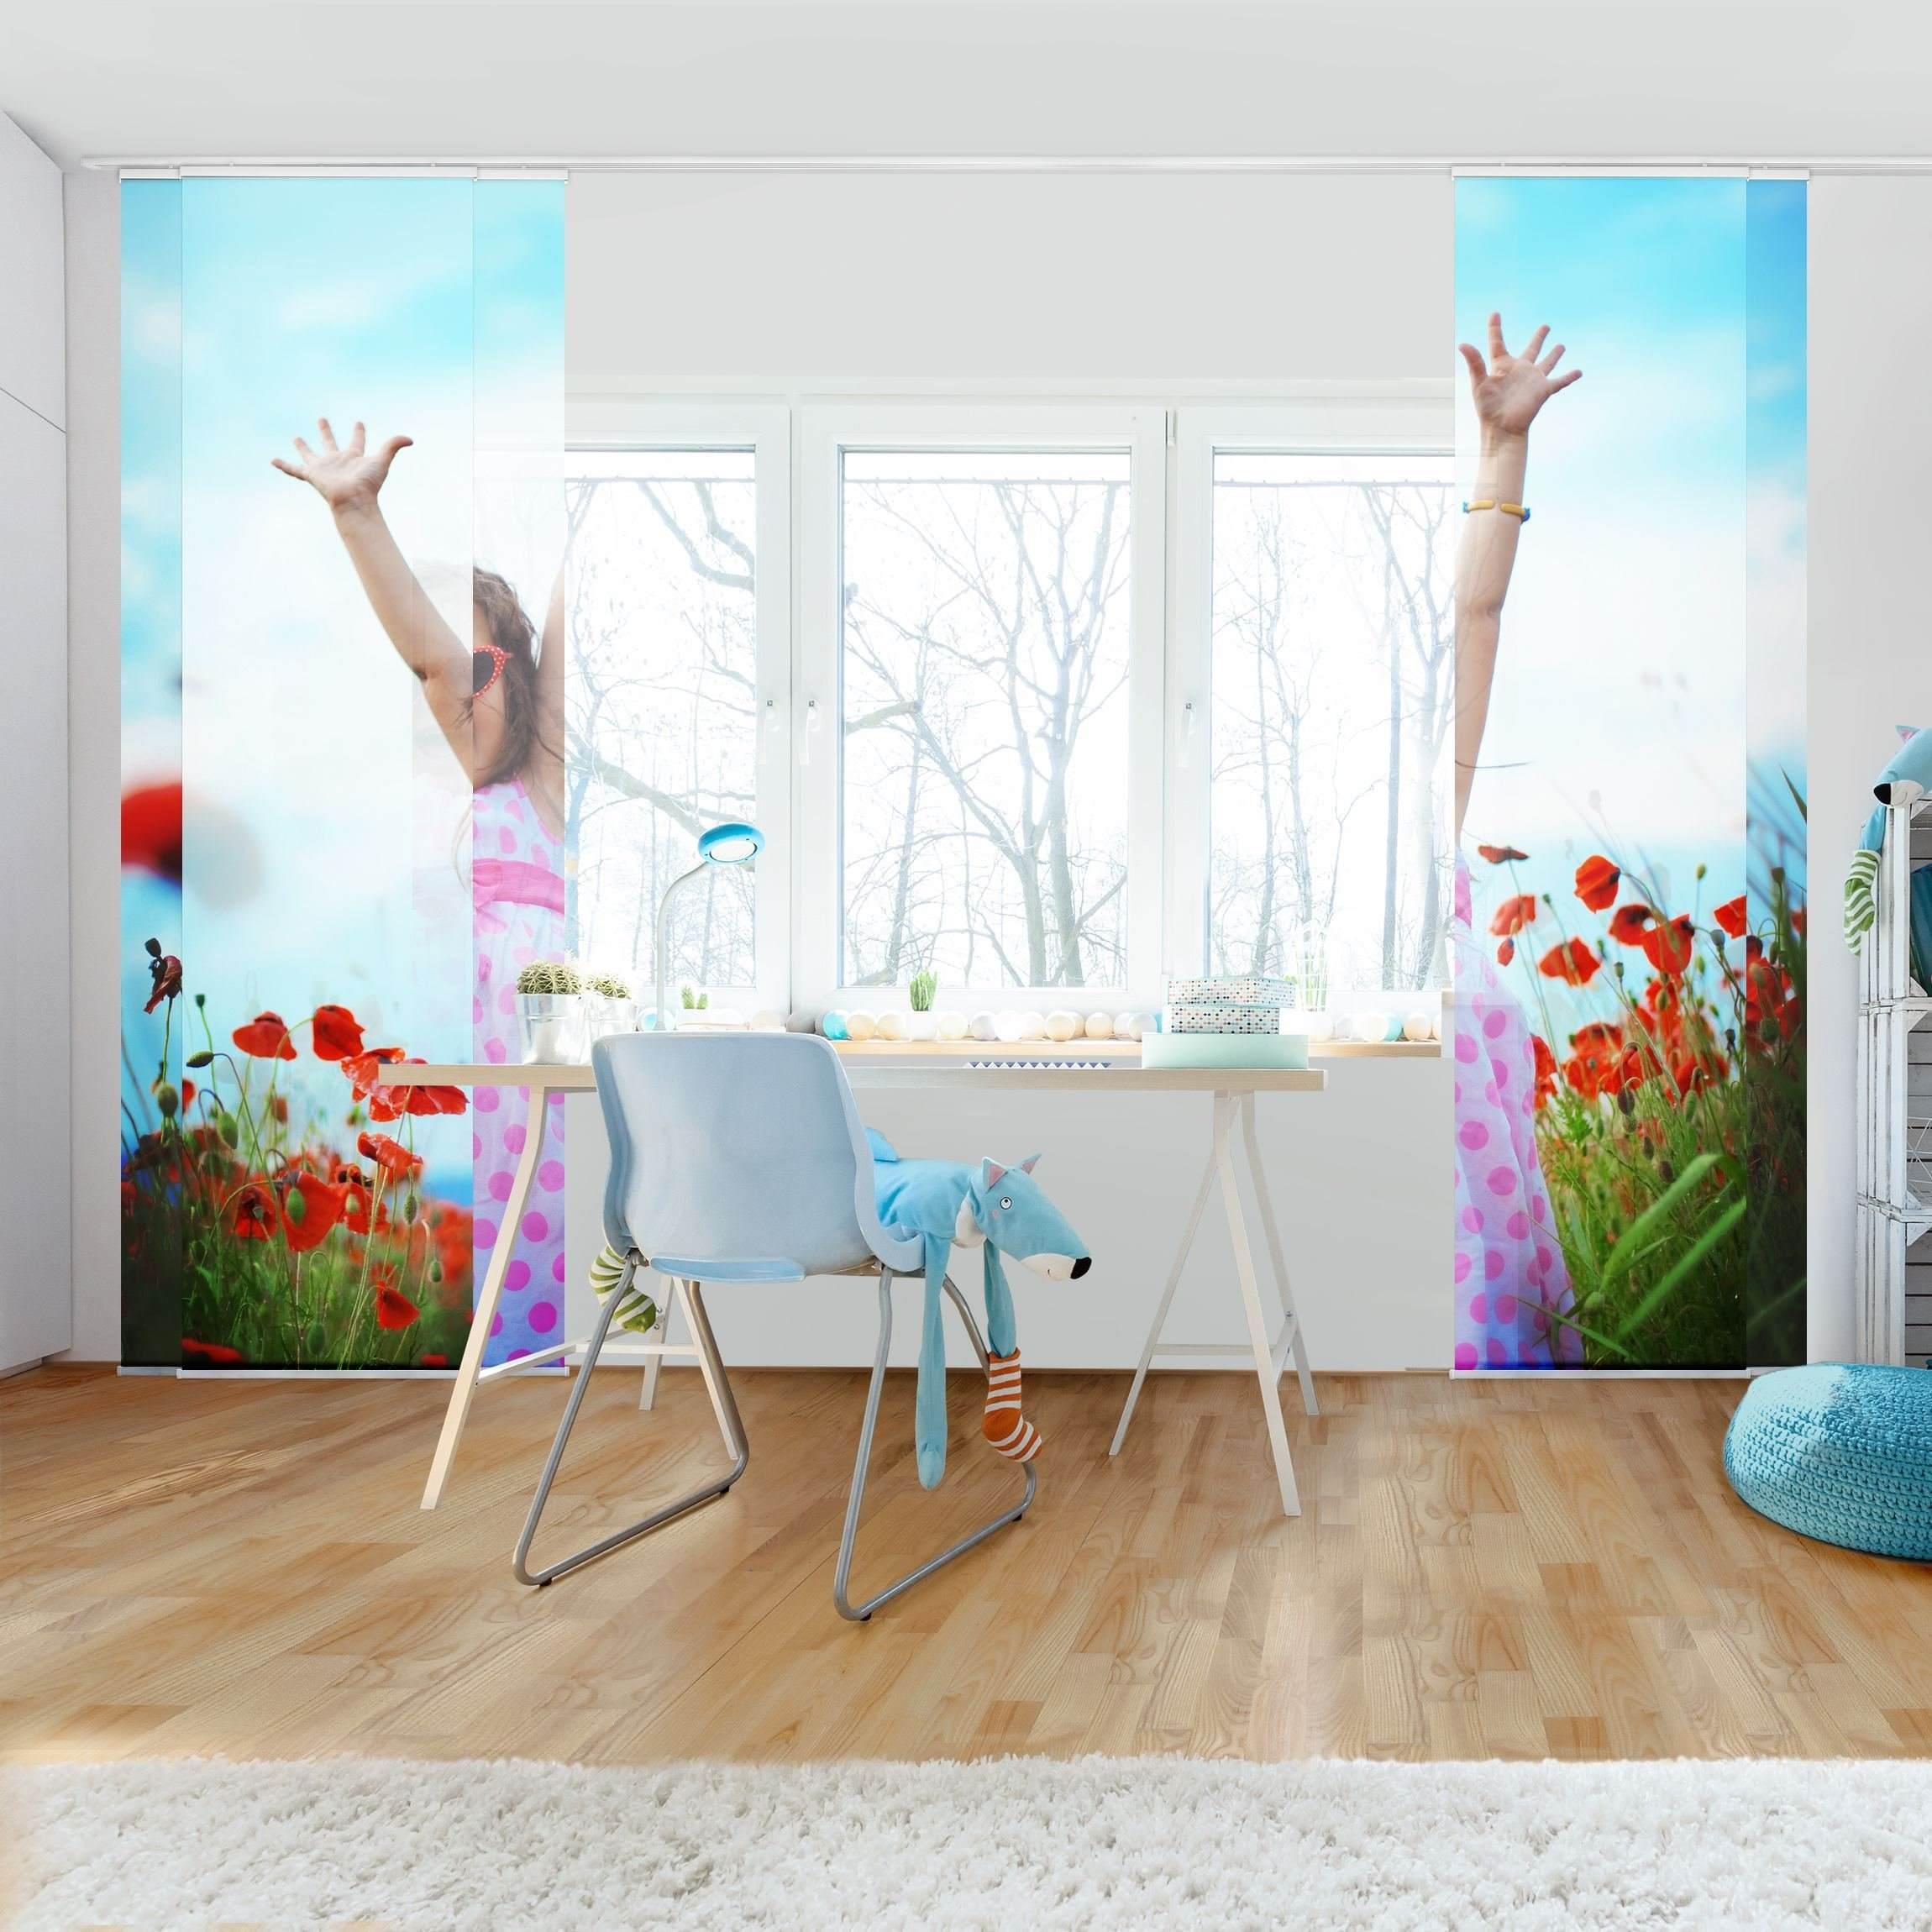 schiebegardinen set wunschbild 5 fl chenvorh nge. Black Bedroom Furniture Sets. Home Design Ideas